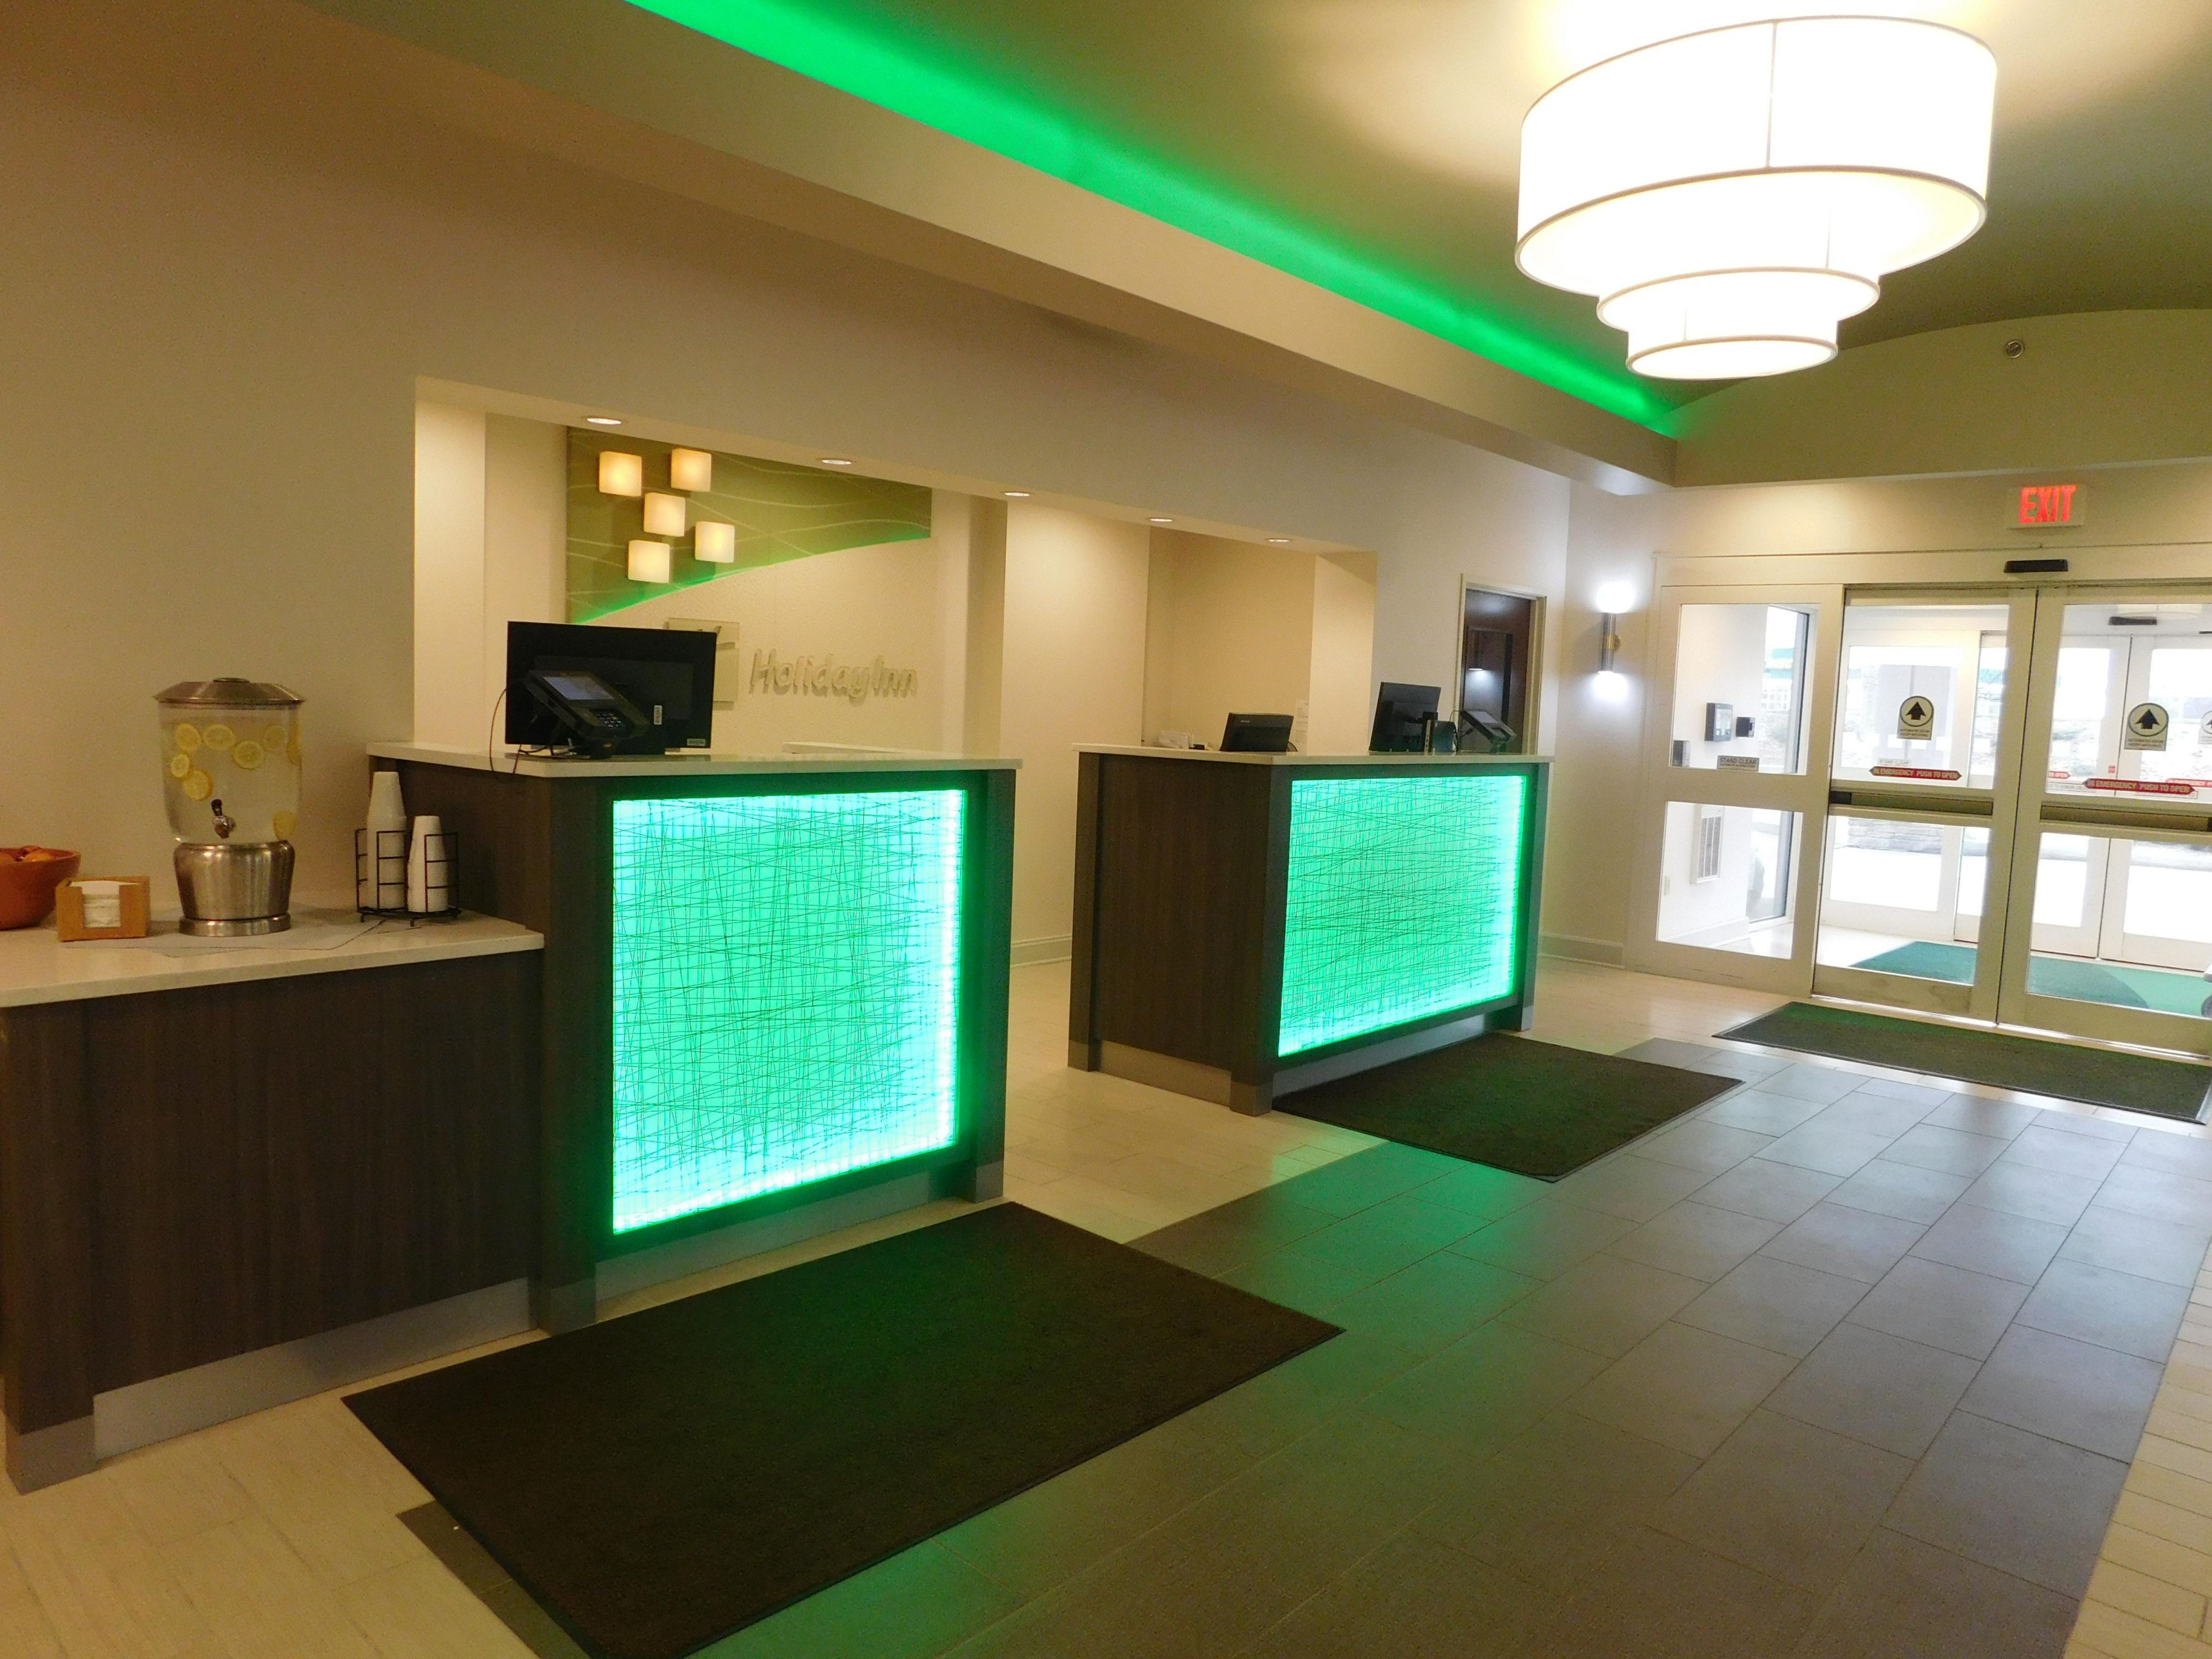 henrietta rochester hotel ny holiday inn hotel suites marketplace rh ihg com